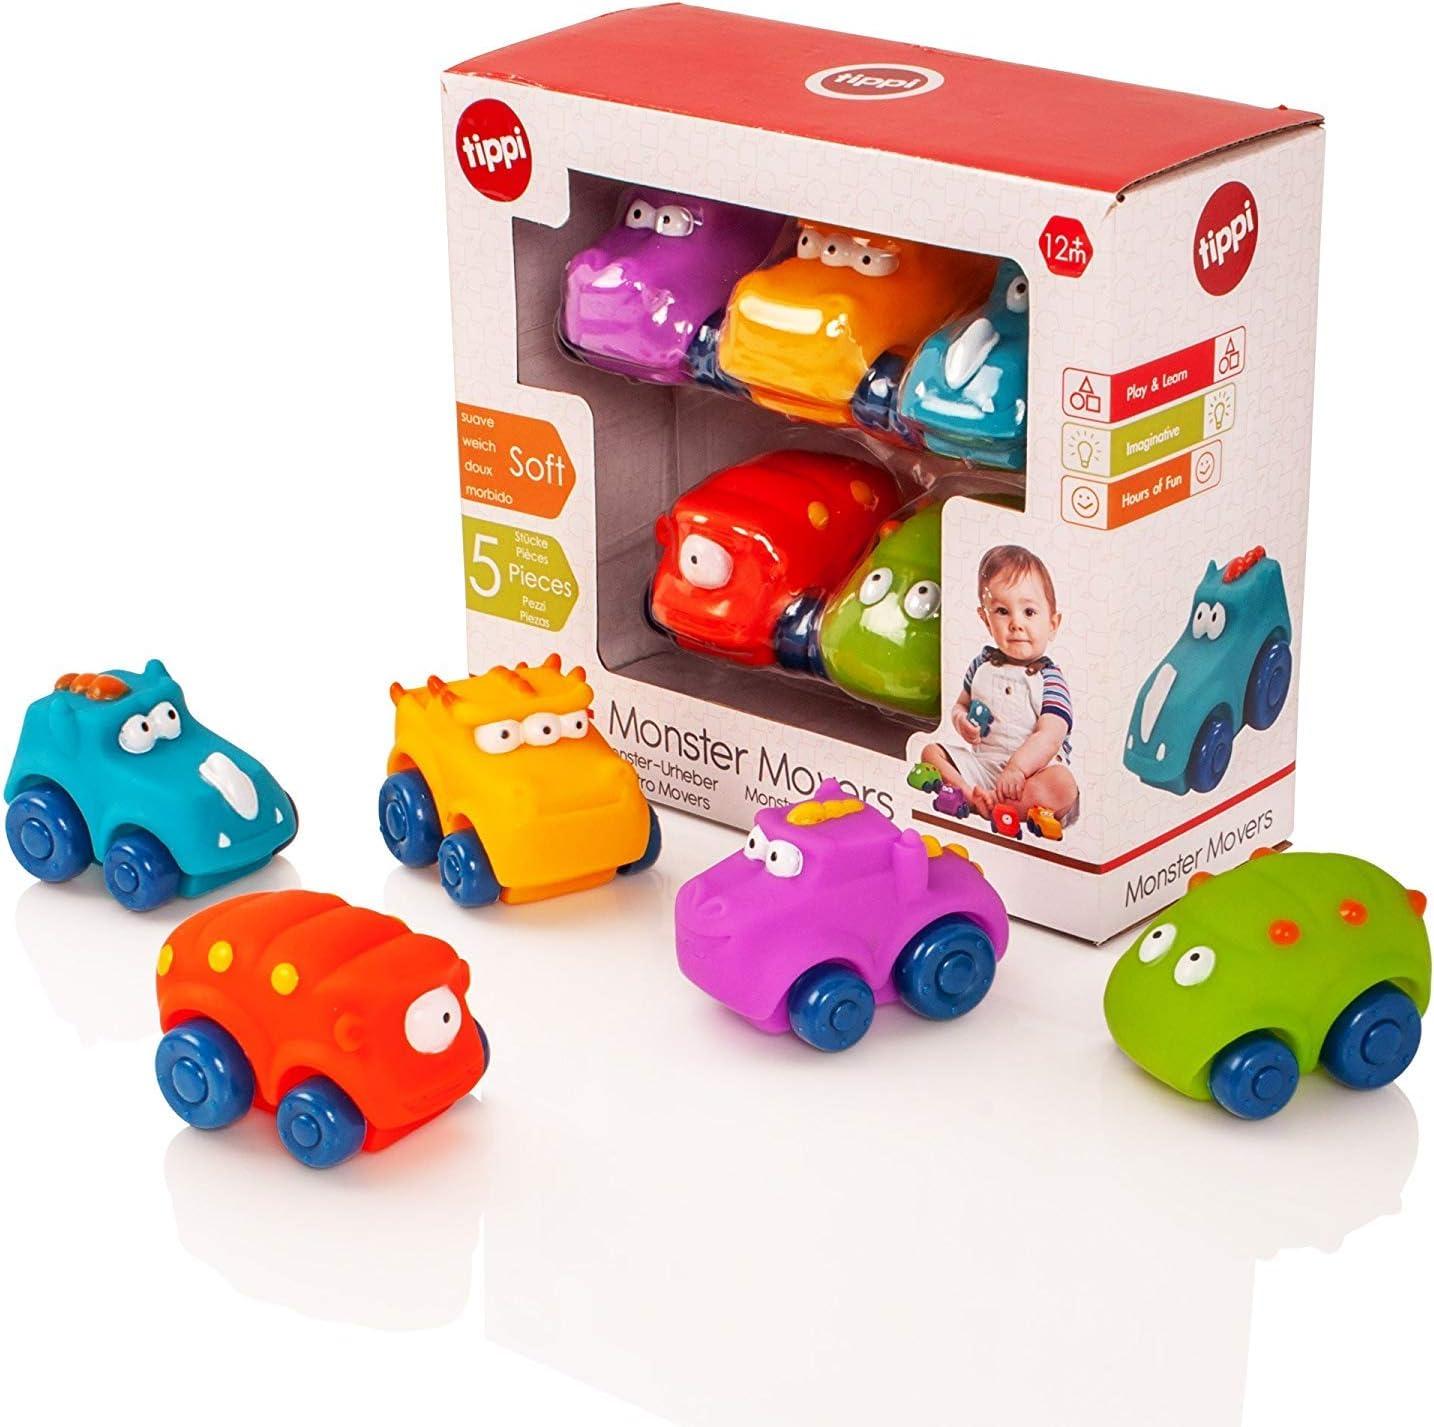 Tippi Monster Movers Juego de Empuje Suave para automóvil Play Along - Bebé o Juguete para niños pequeños (Set de 5)